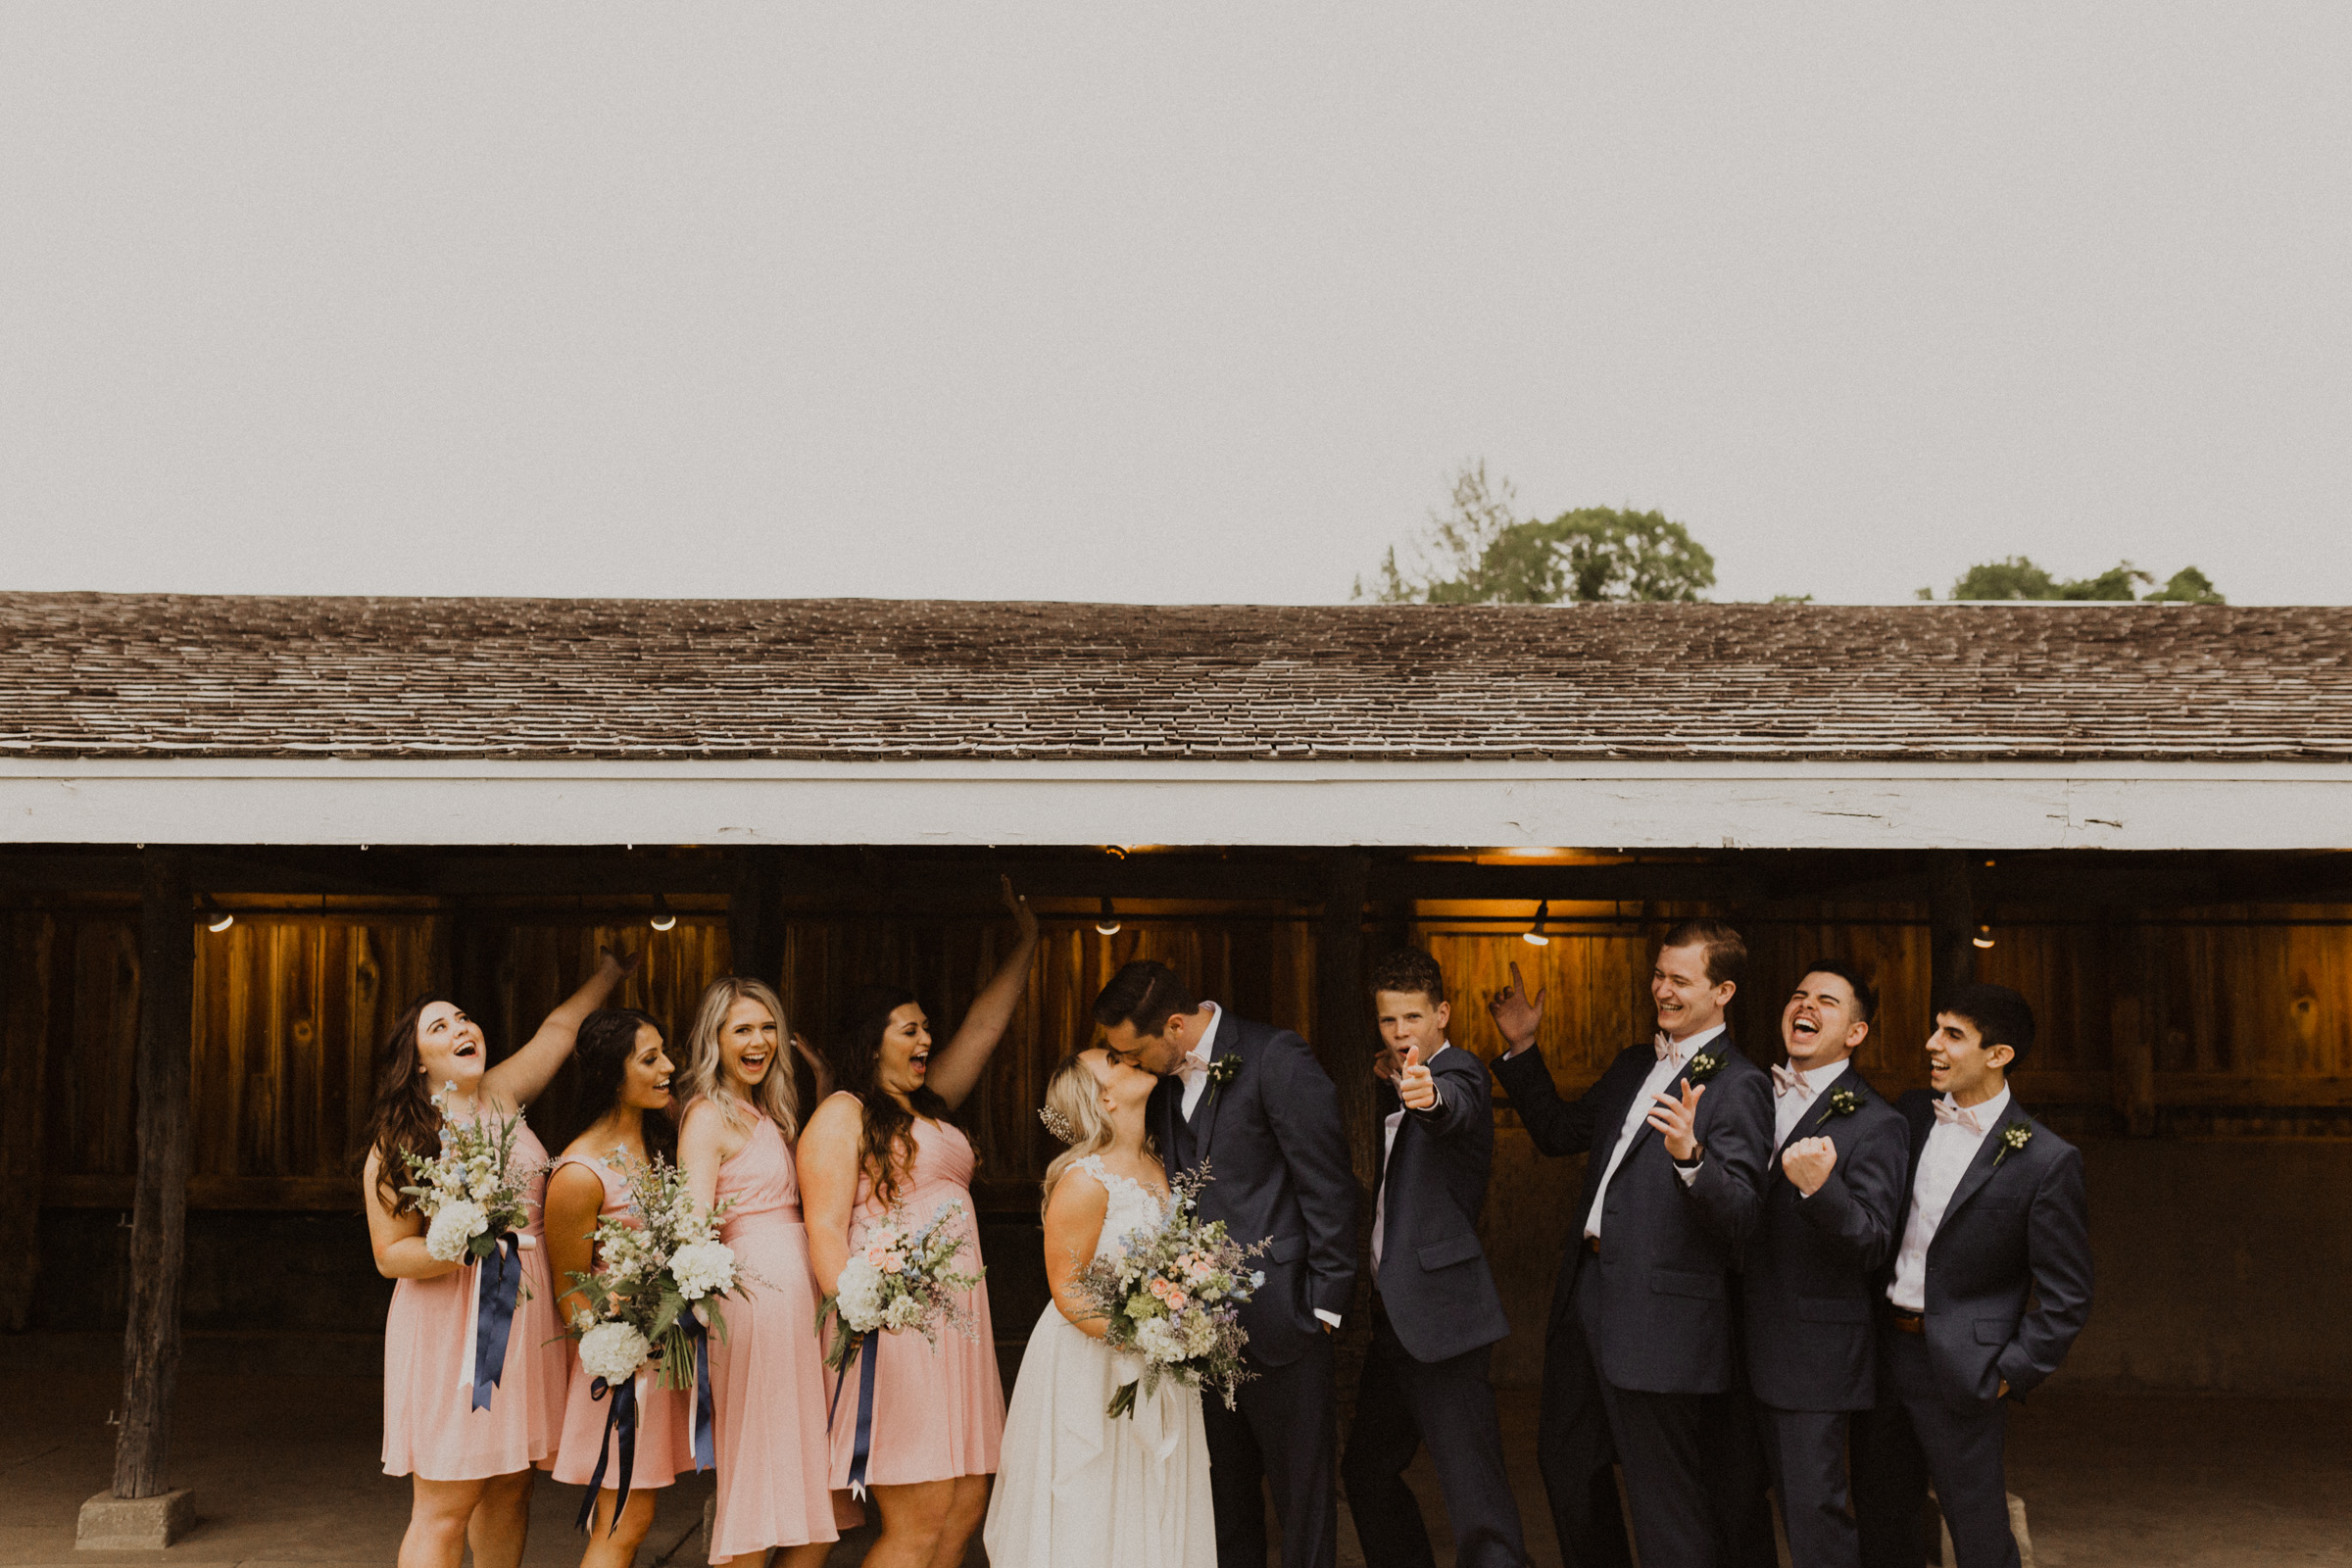 alyssa barletter photography nelson wedding nebraska city lied lodge morton barn spring wedding photographer-21.jpg